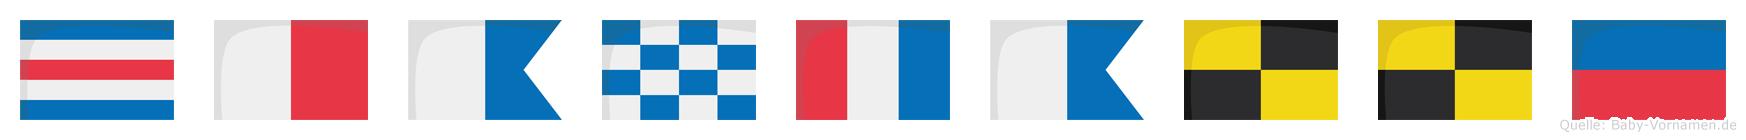 Chantalle im Flaggenalphabet